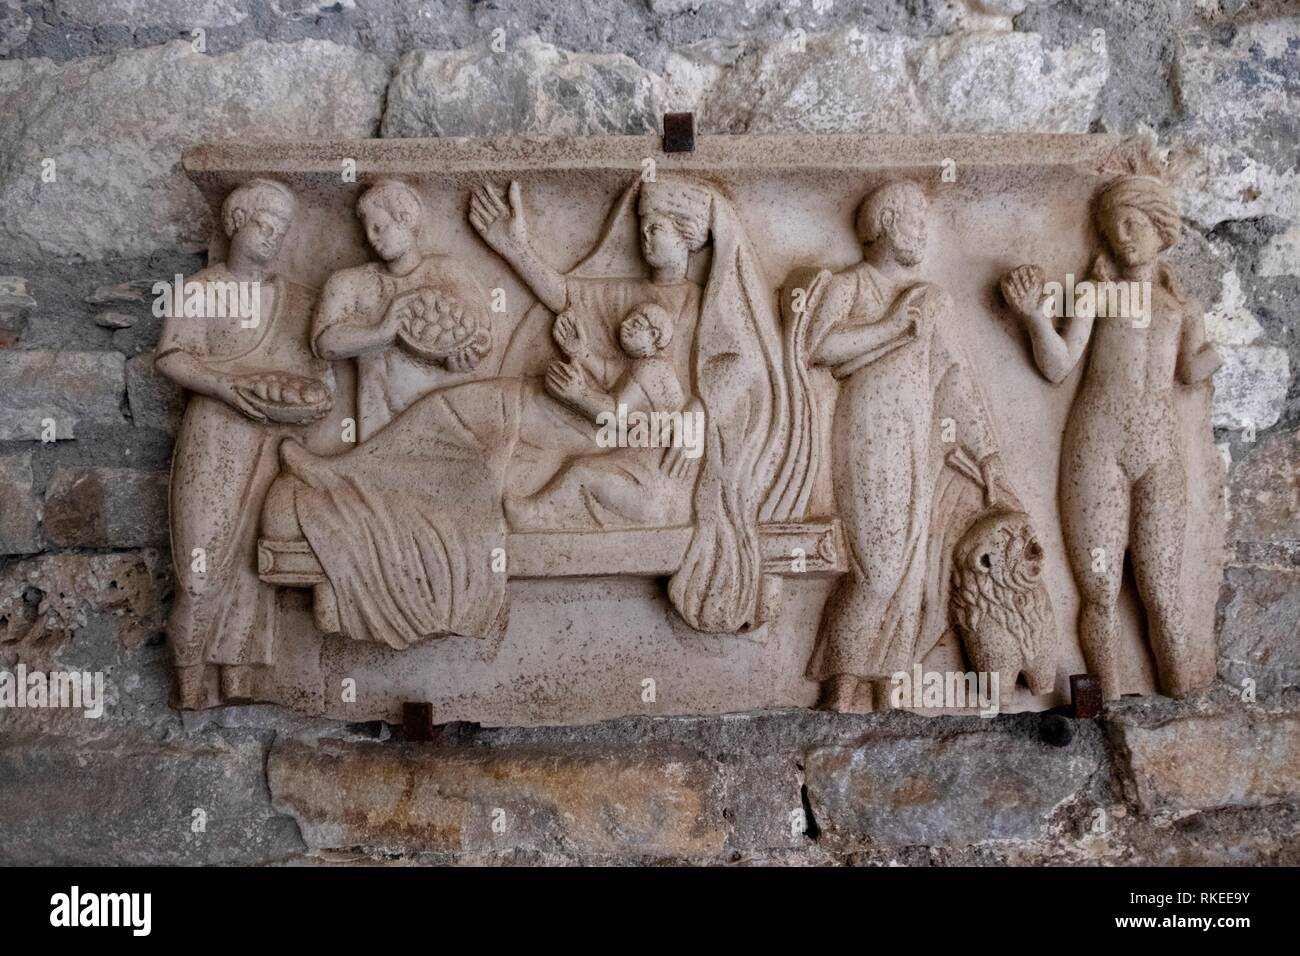 France. Occitanie, Haute Garonne, Goll ,roman plate (5th Century) at the Basilic Saint Just dee Valcabrère. - Stock Image